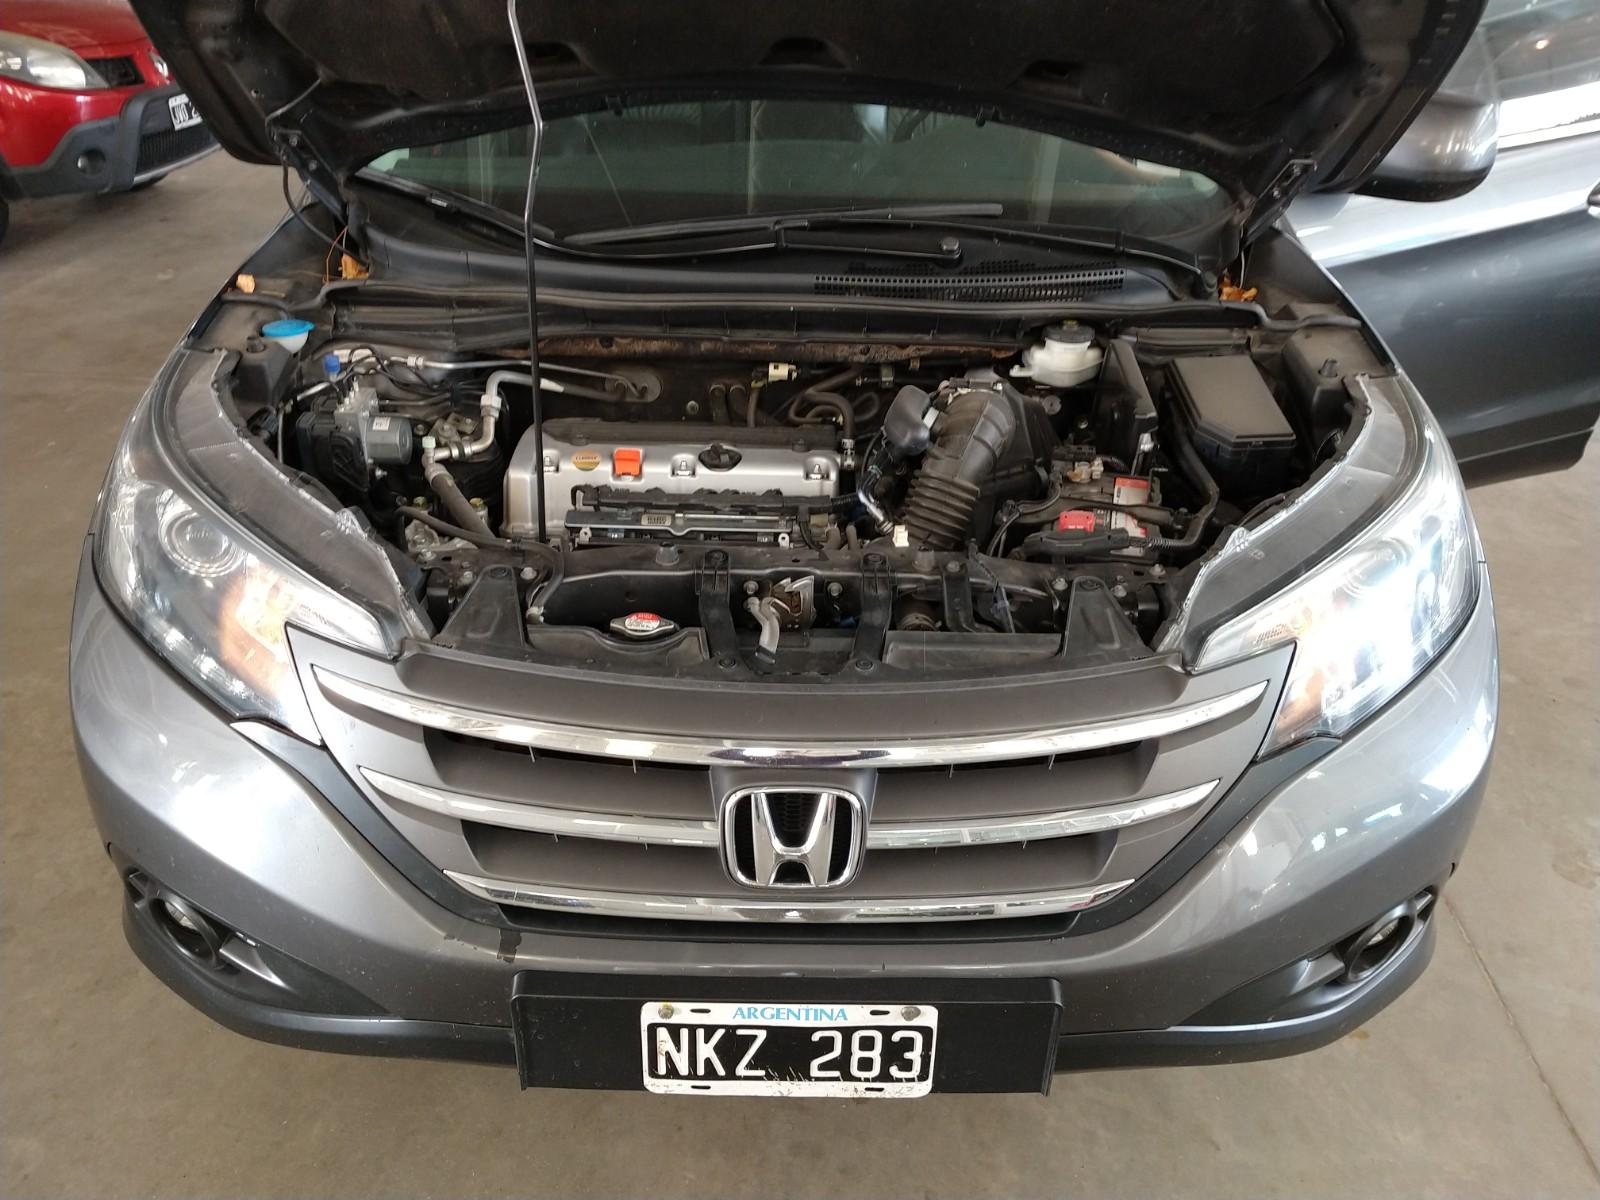 2014 HONDA CRV EXL 4X4 2,4